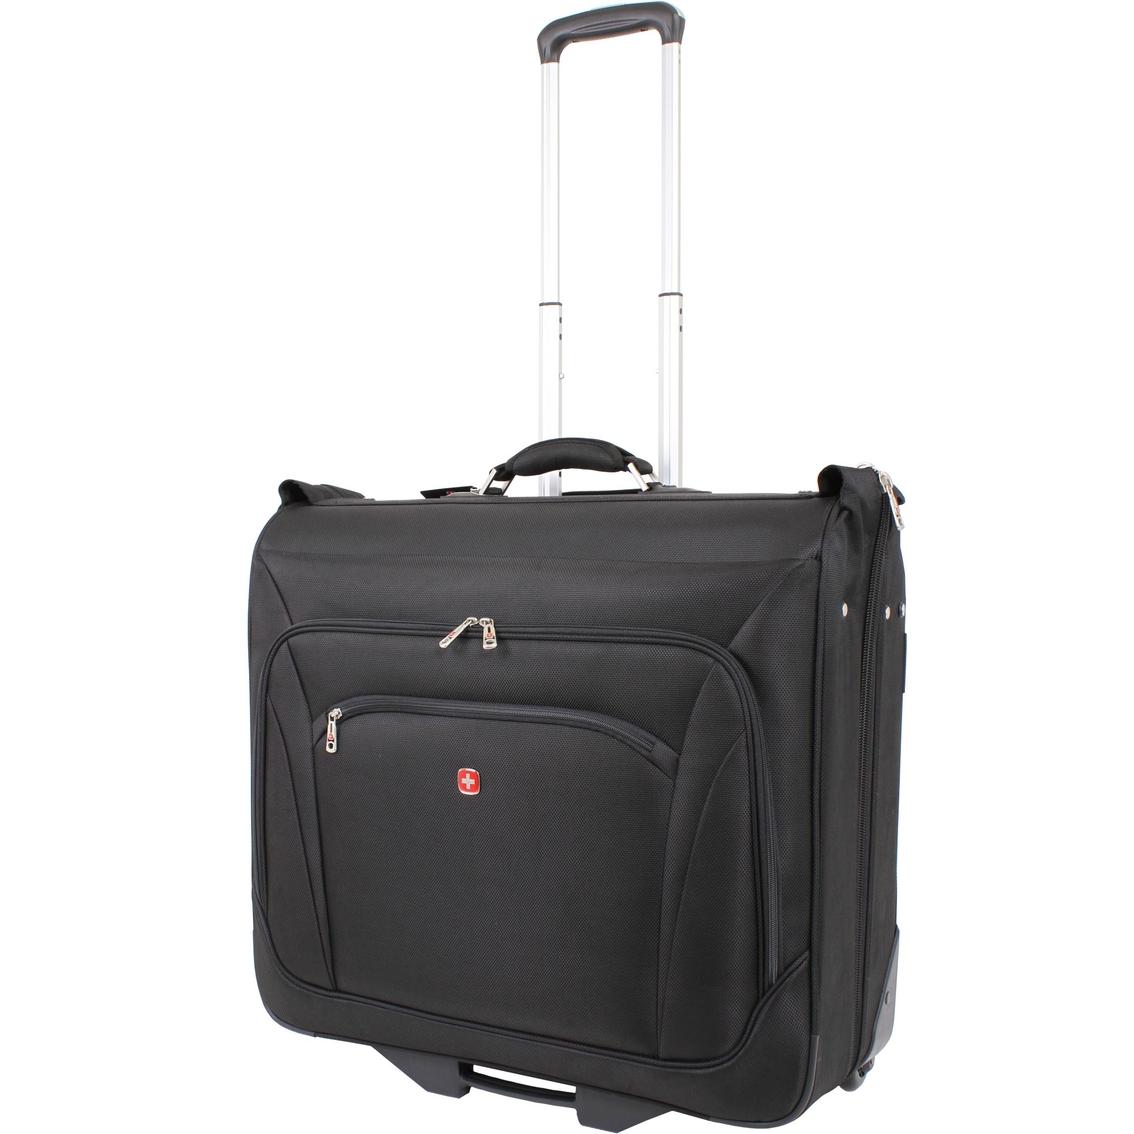 swiss gear zurich 46 in garment bag luggage more shop the exchange